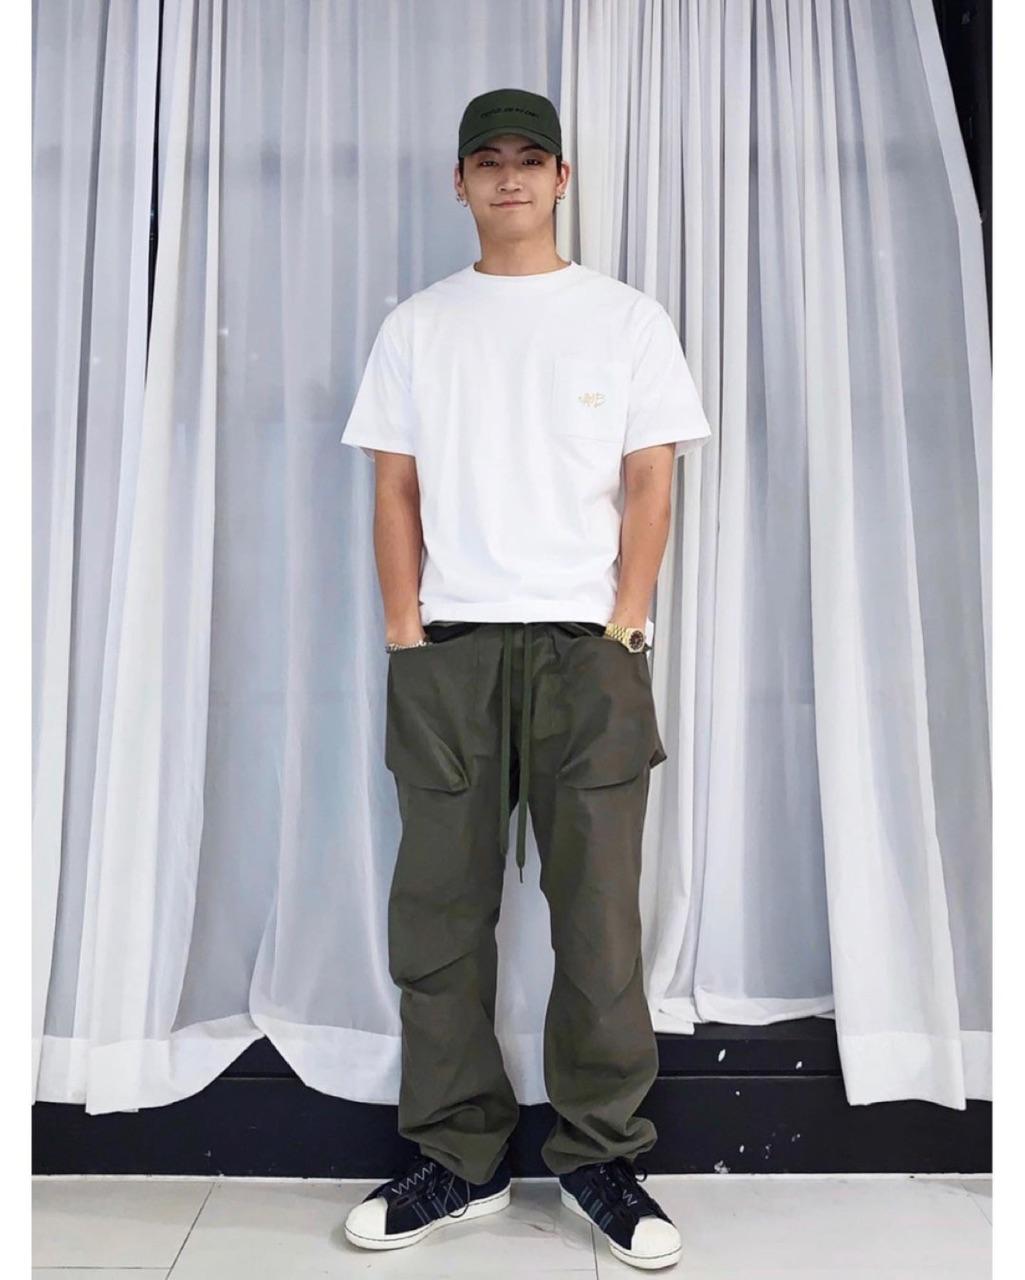 JB, def, and kpop image